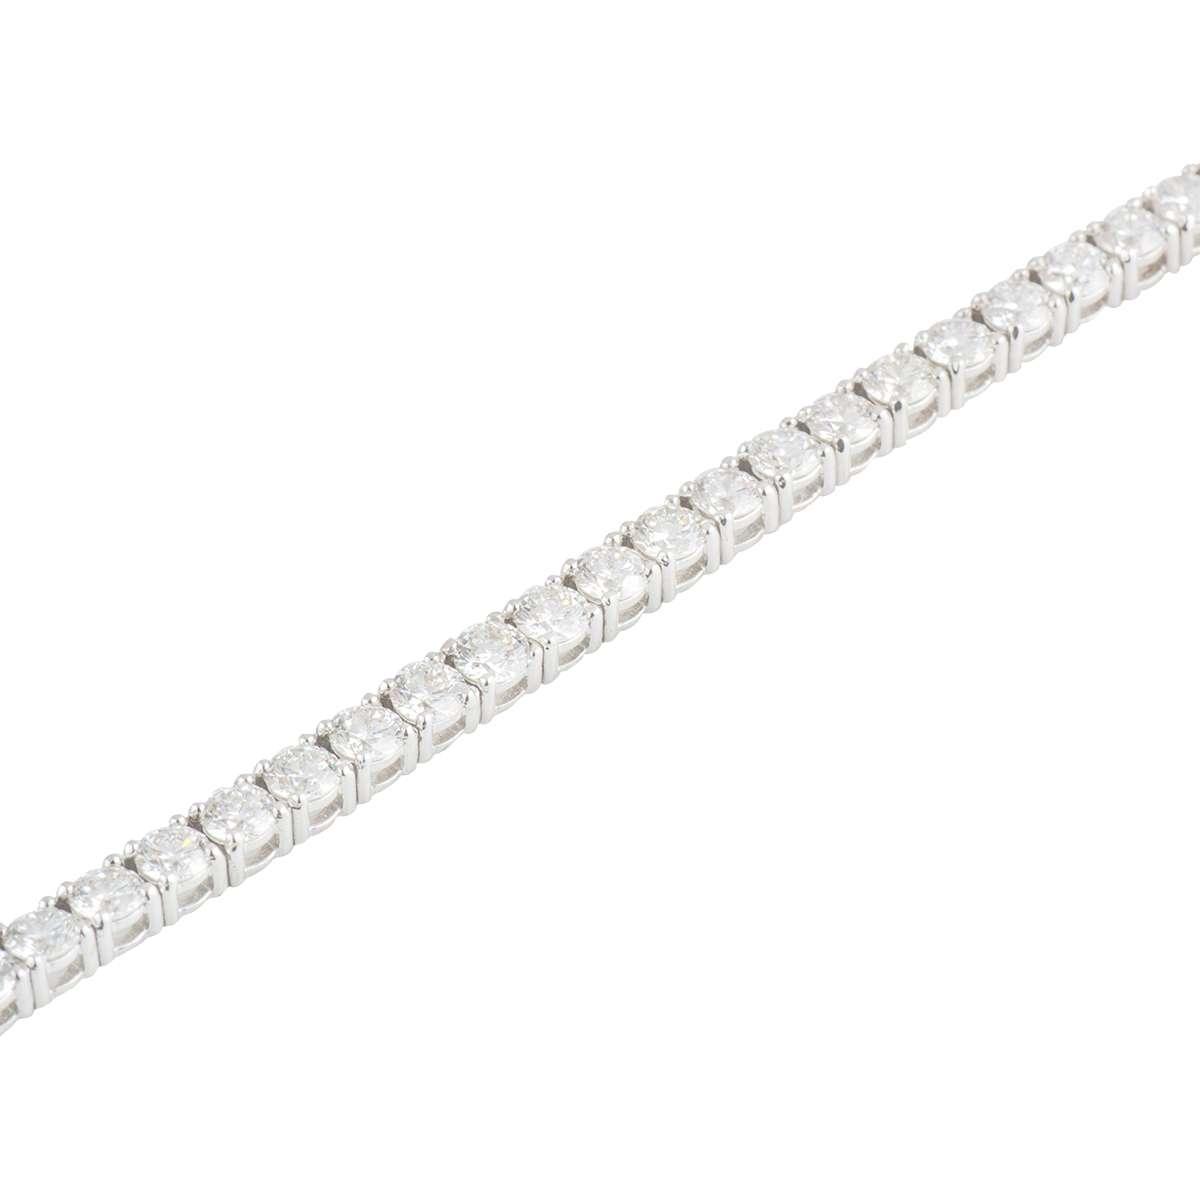 Diamond Line Bracelet 5.30ct G-H/VS